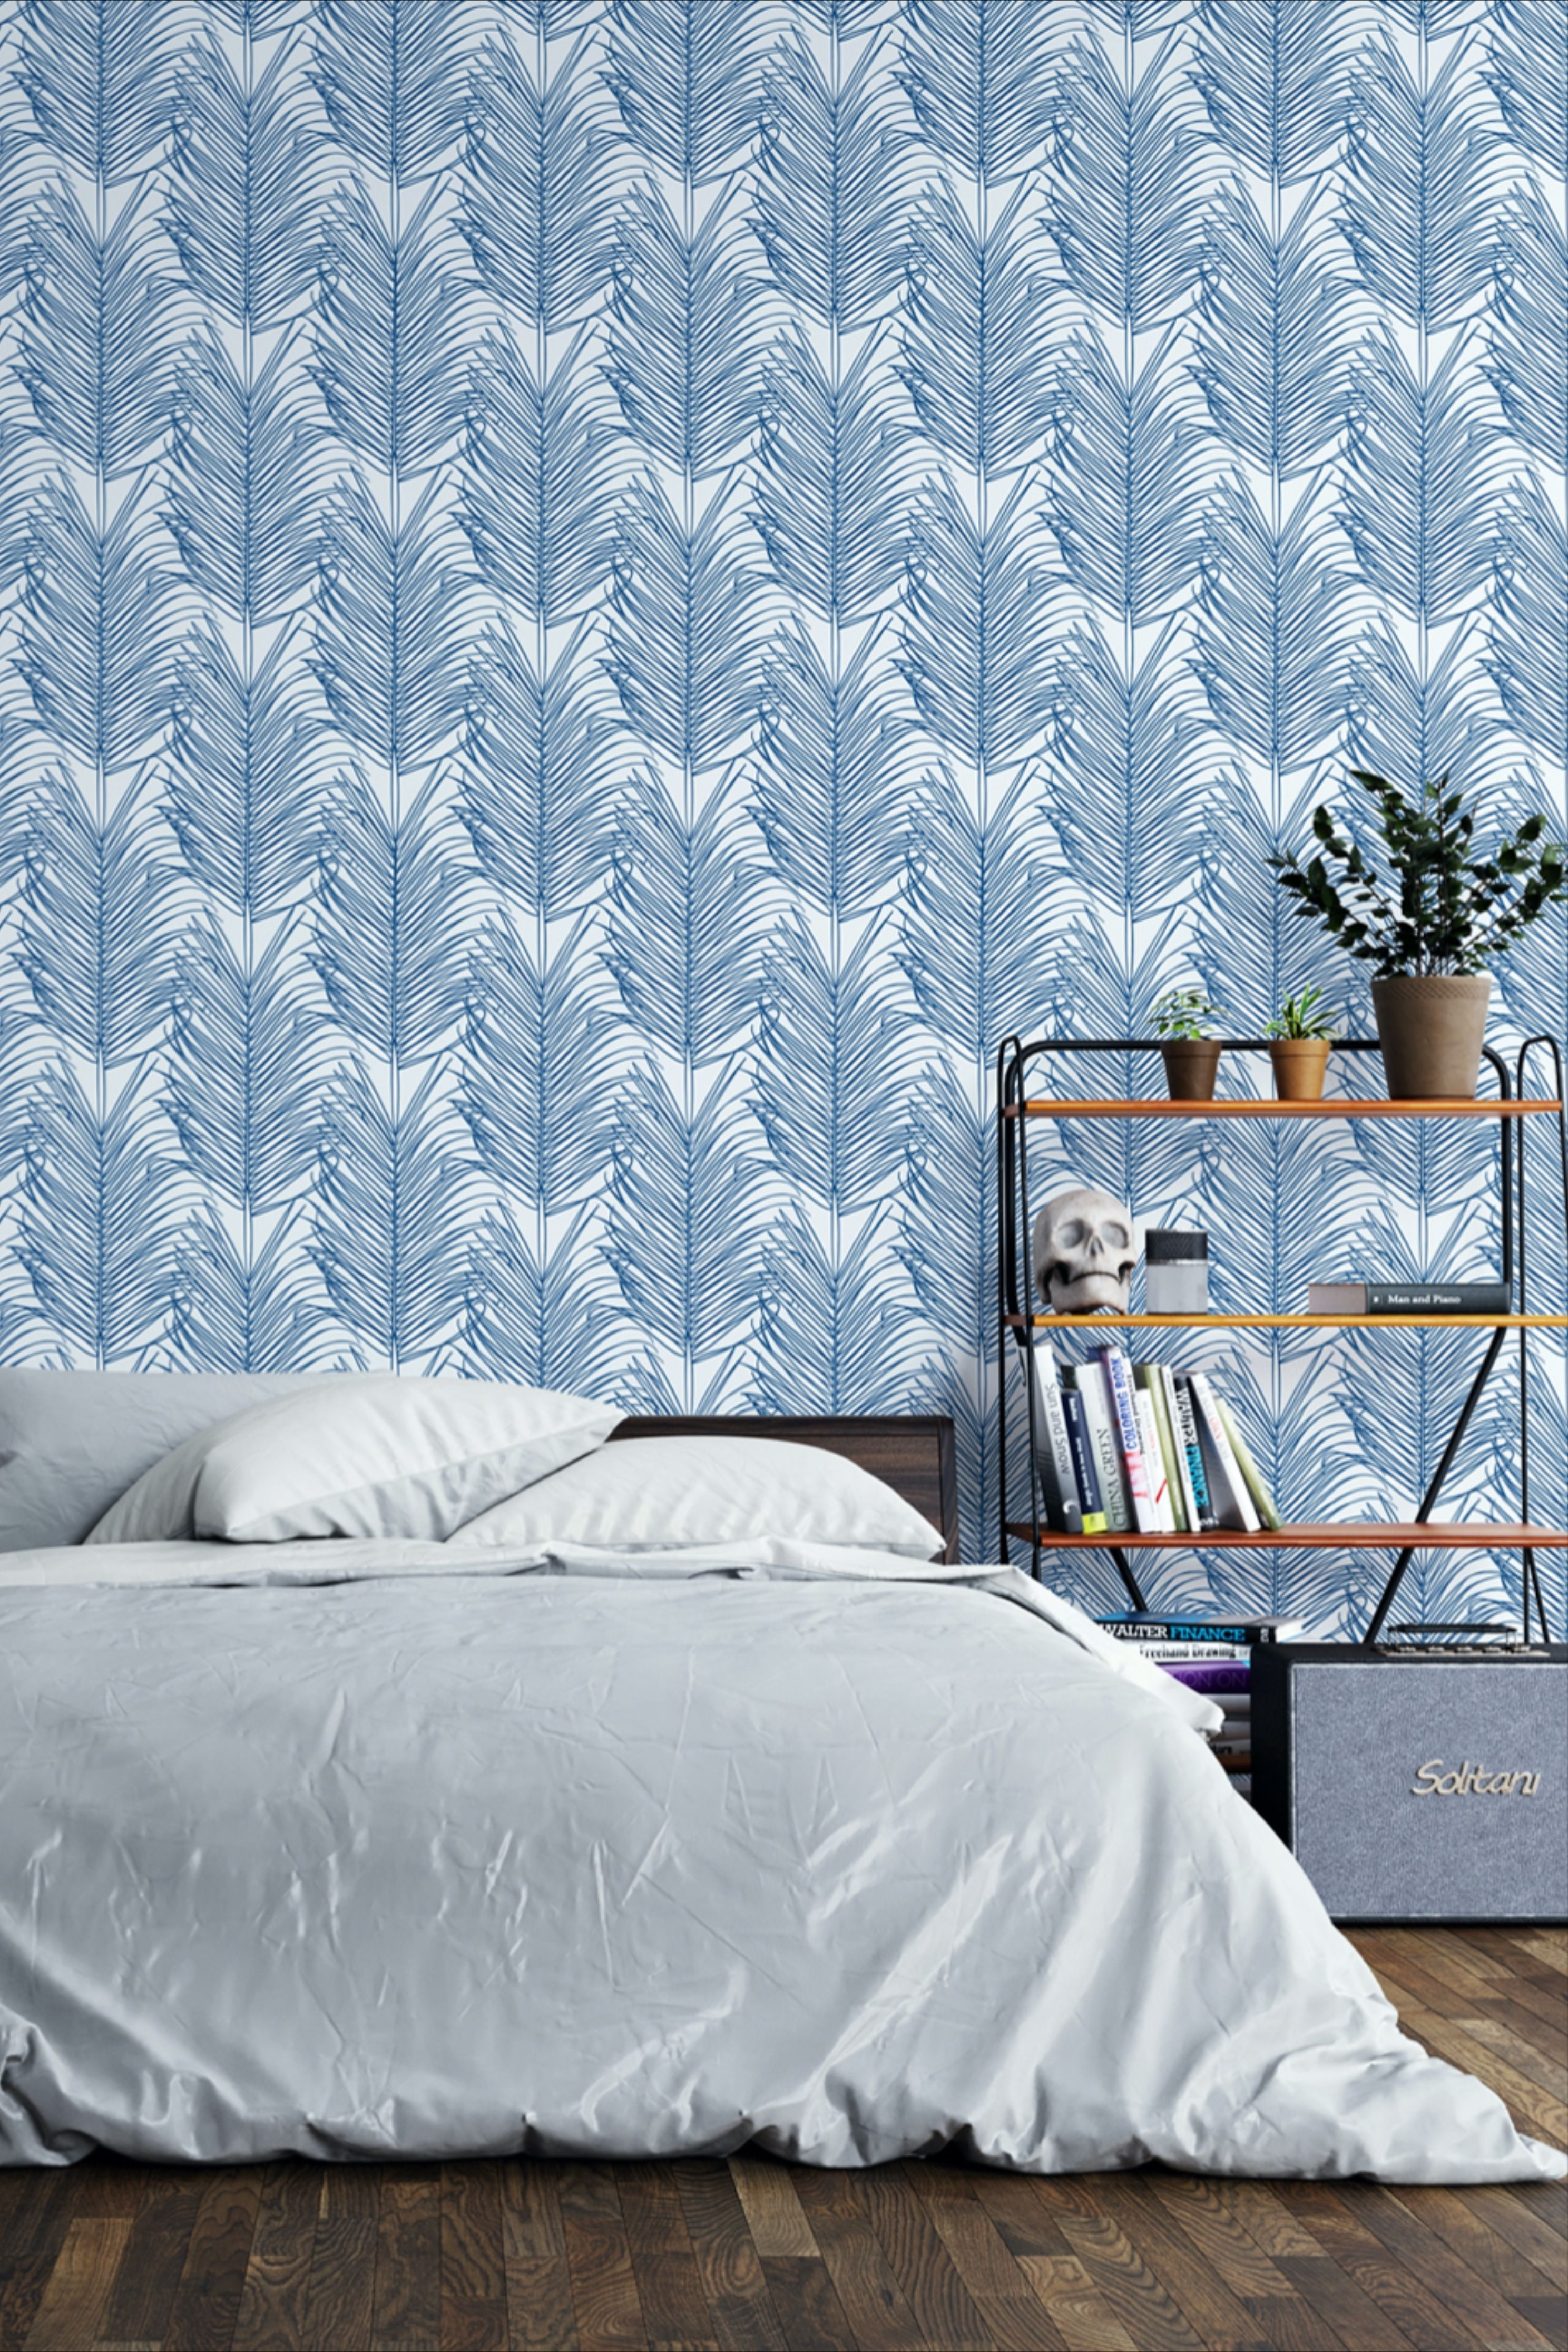 Coastal Blue Wallpaper Peel And Stick Beach Self Adhesive Etsy Blue Wallpaper Bedroom Coastal Blue Blue Wallpapers